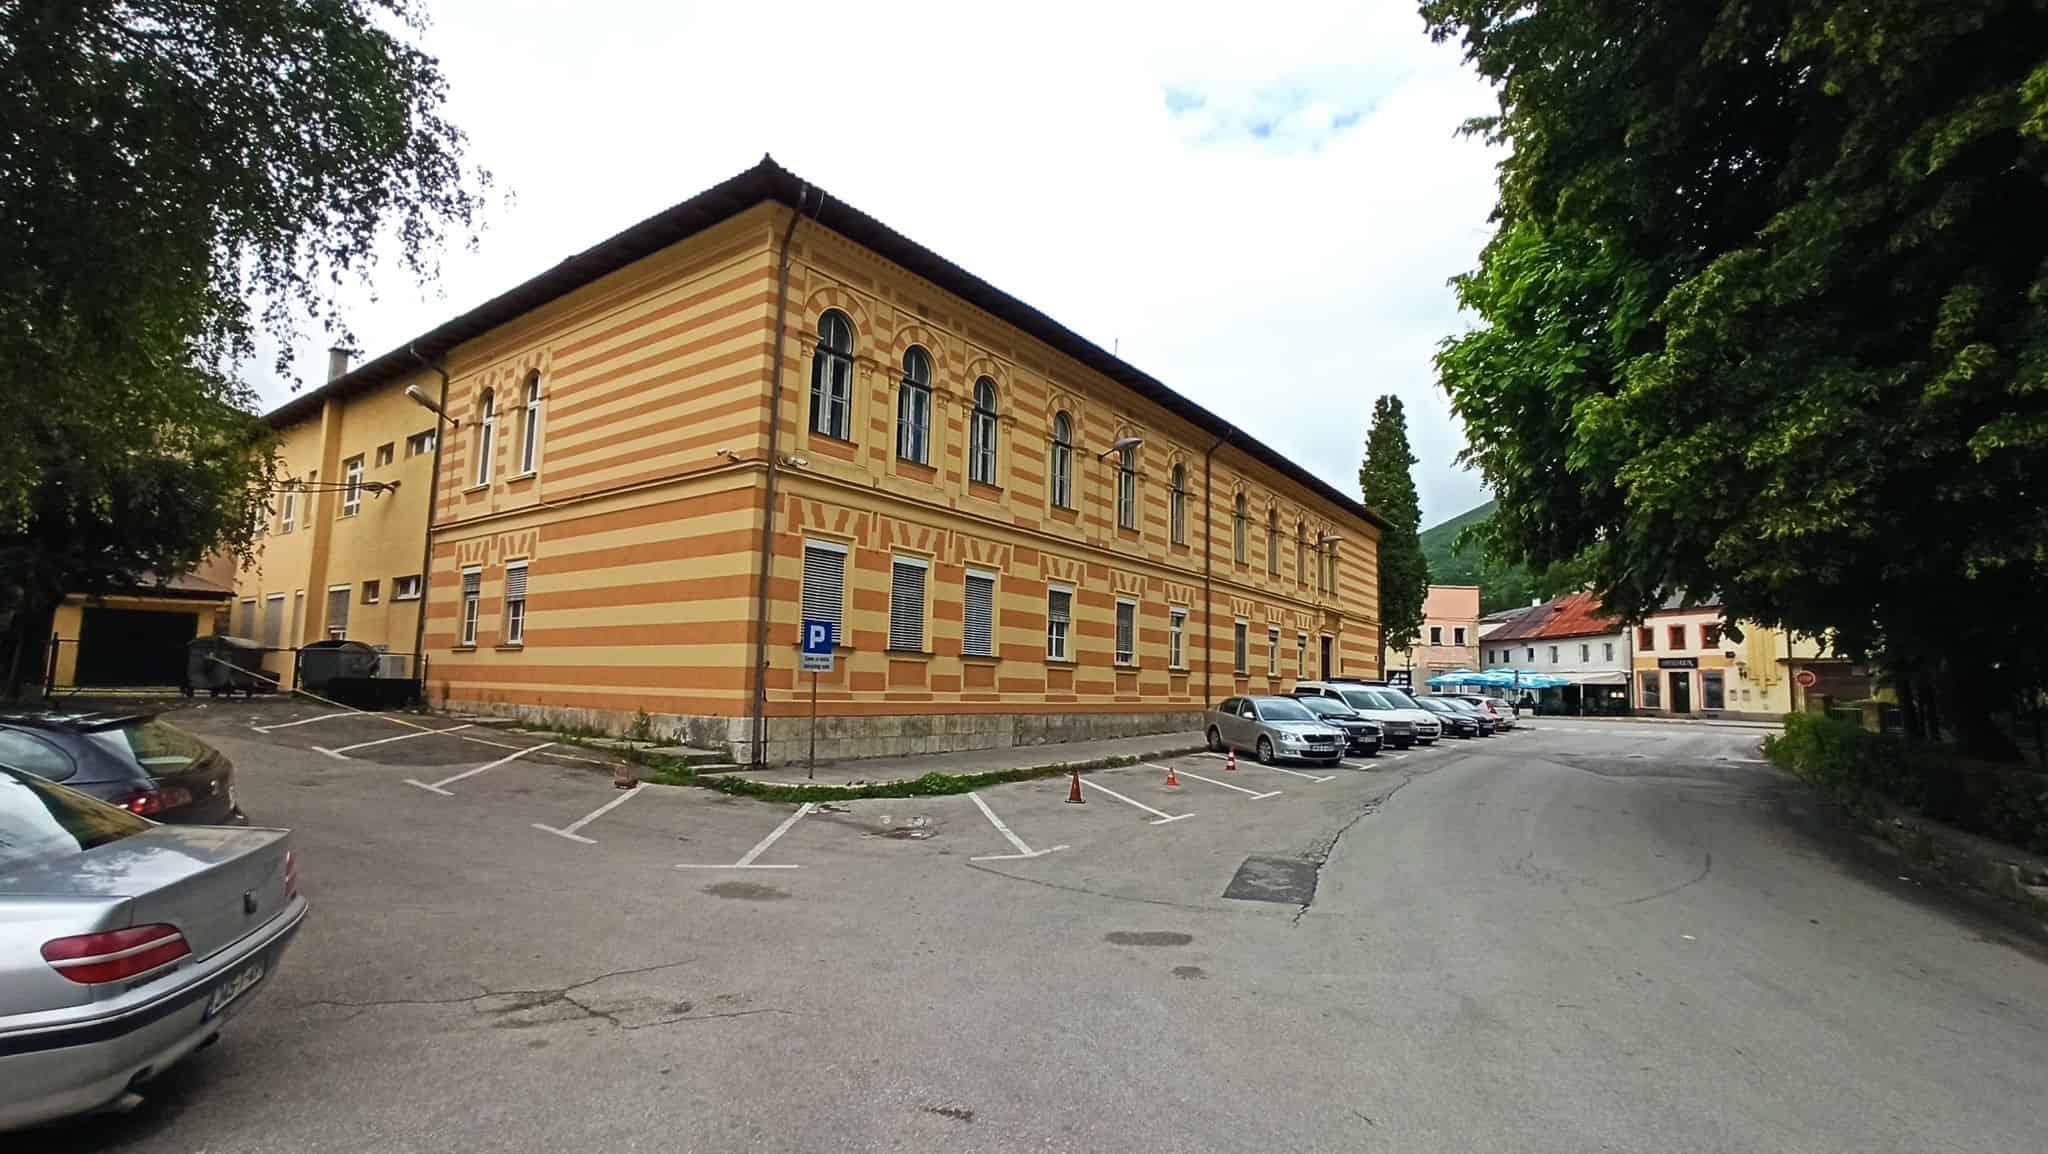 Rješenja za upoznavanje Travnik Bosna i Hercegovina